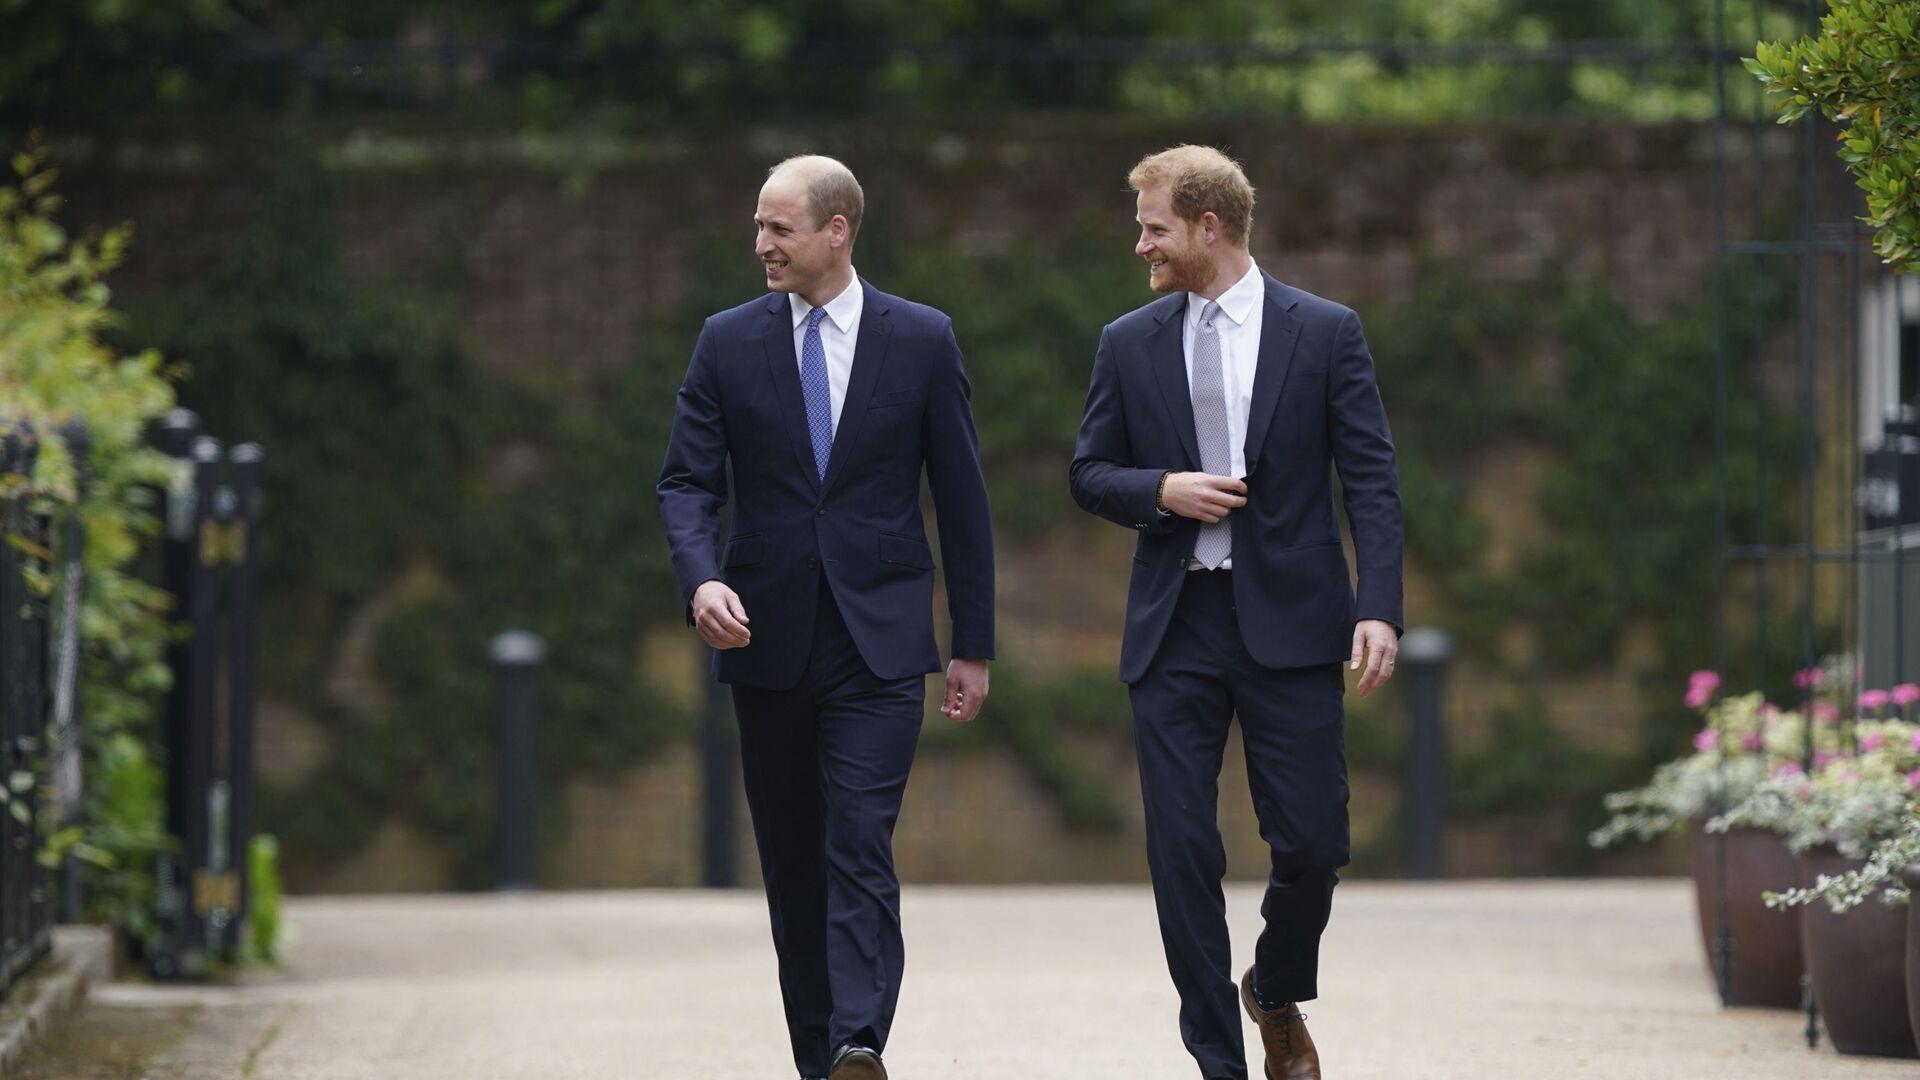 Londra: i principi William ed Harry inaugurano la statua a Lady Diana  - Sputnik Italia, 1920, 01.07.2021